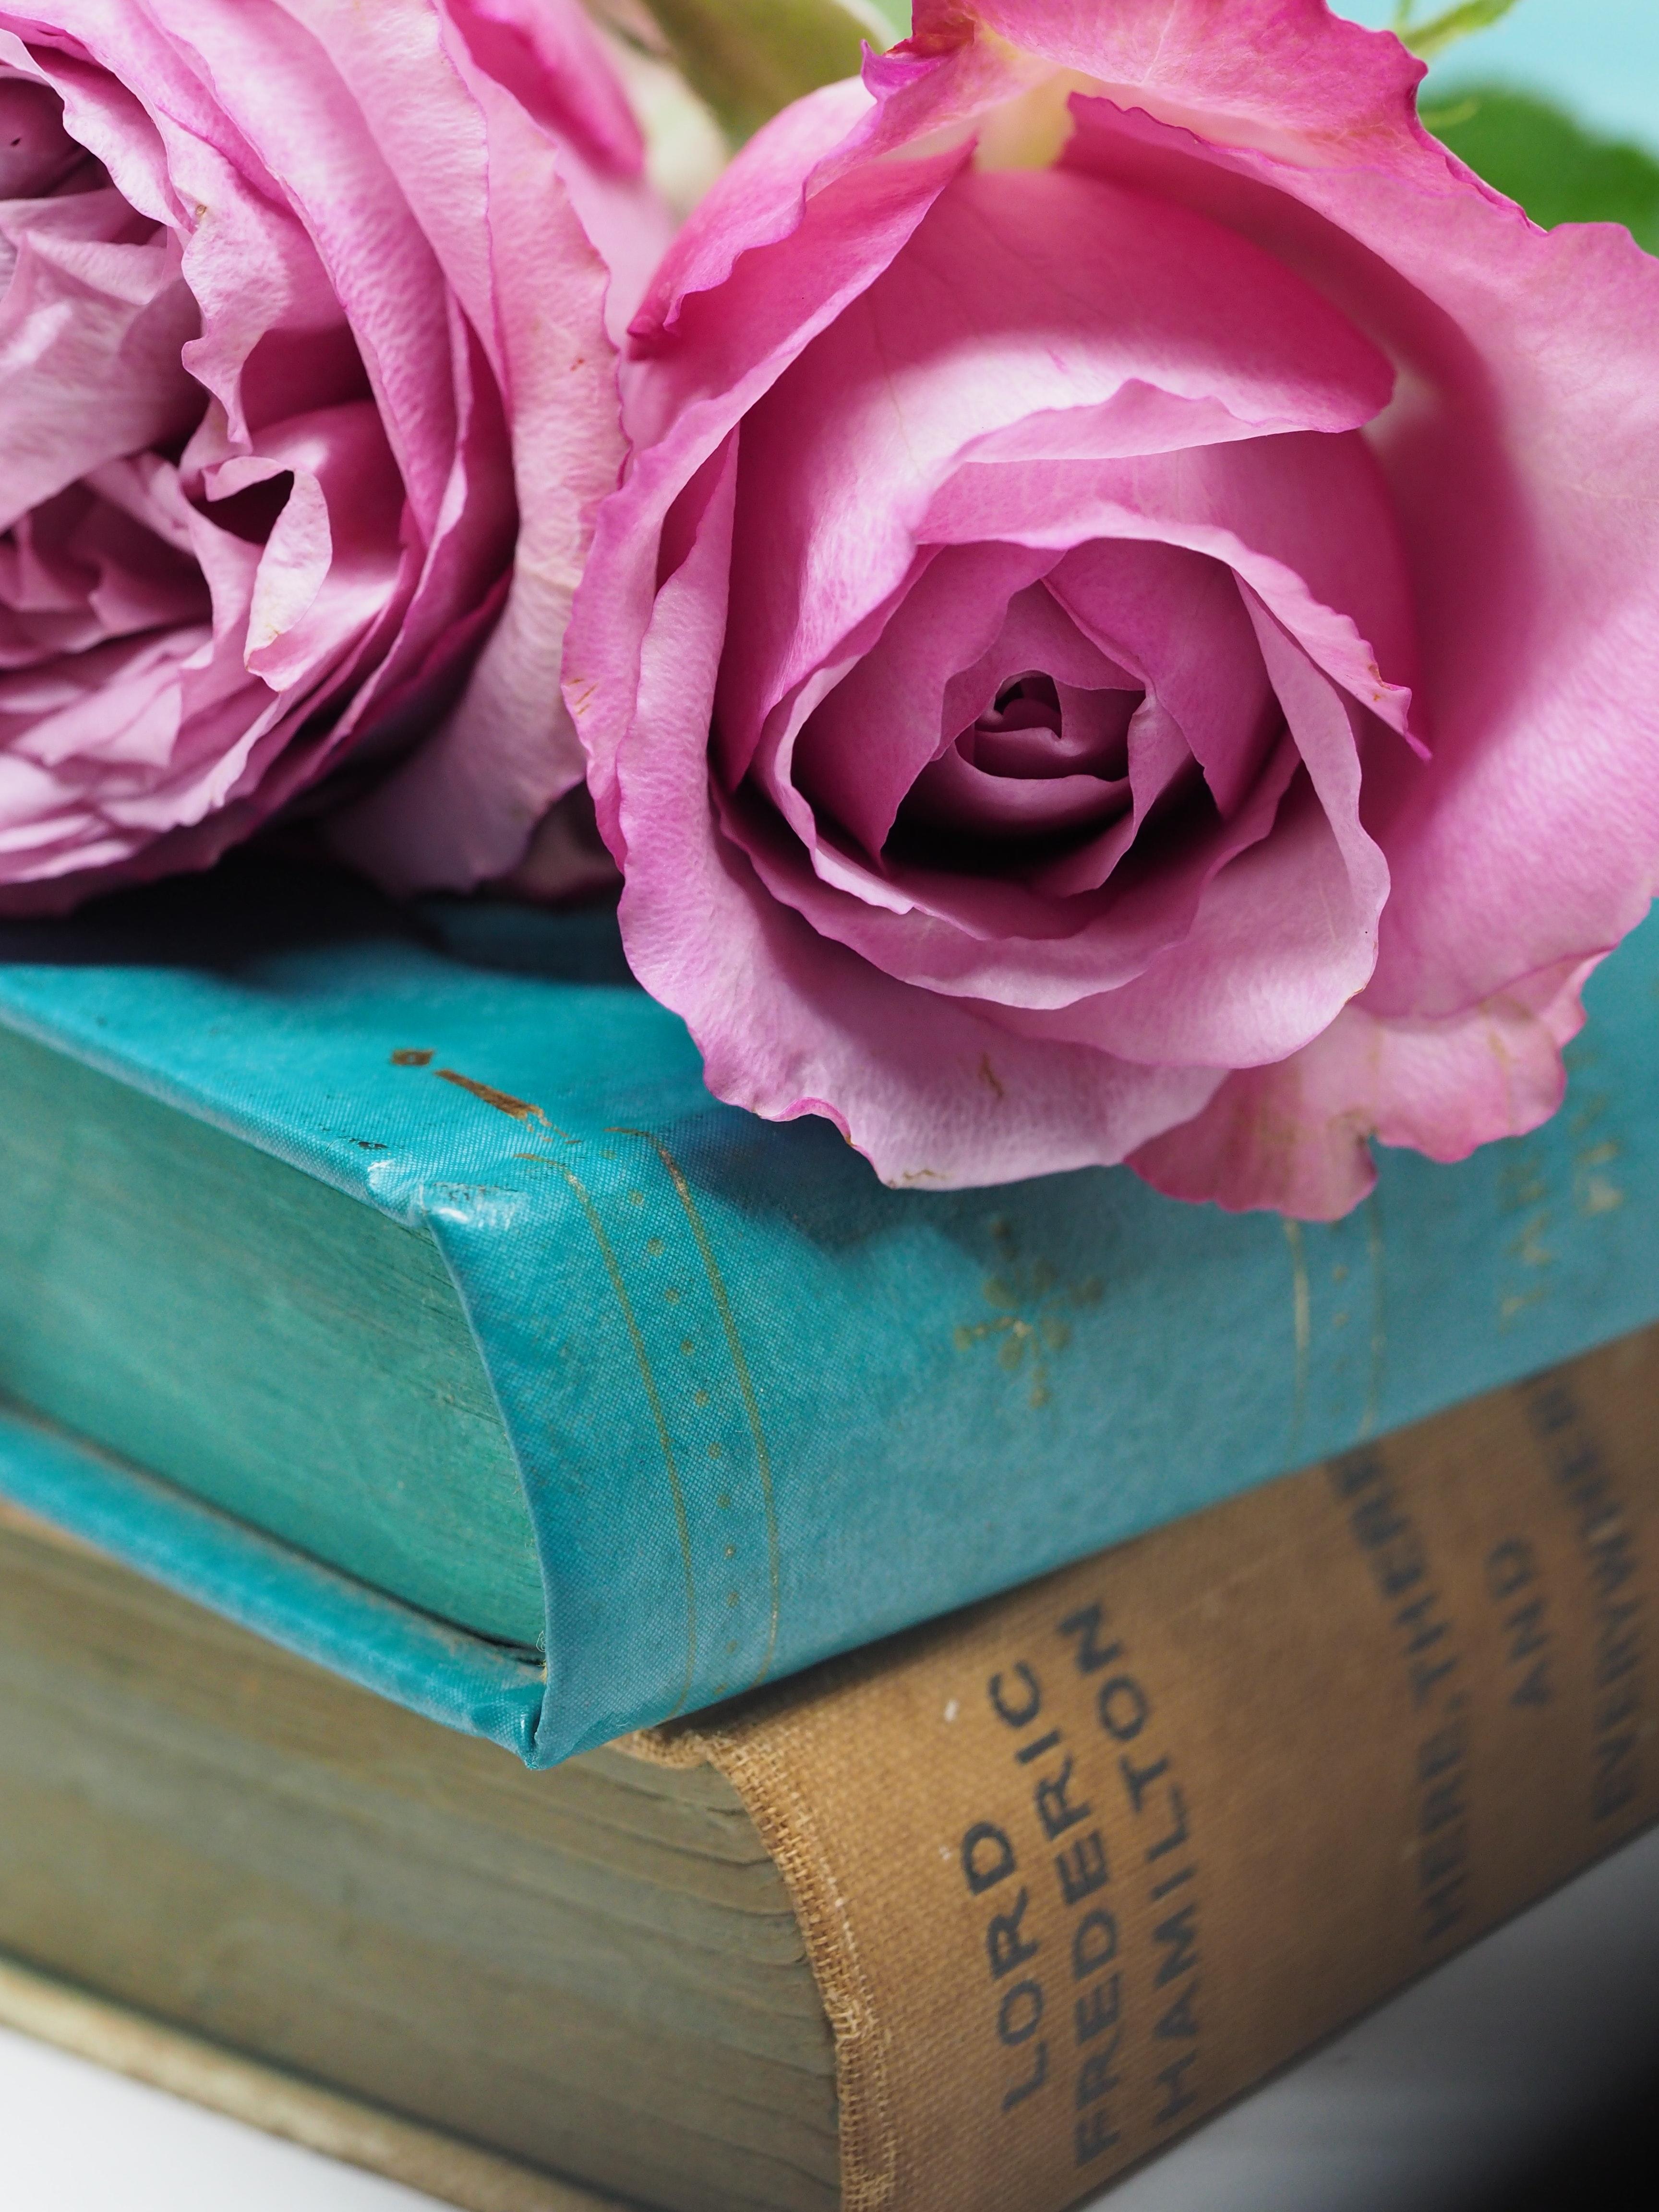 Pink rose flower on blue hardbound books photo